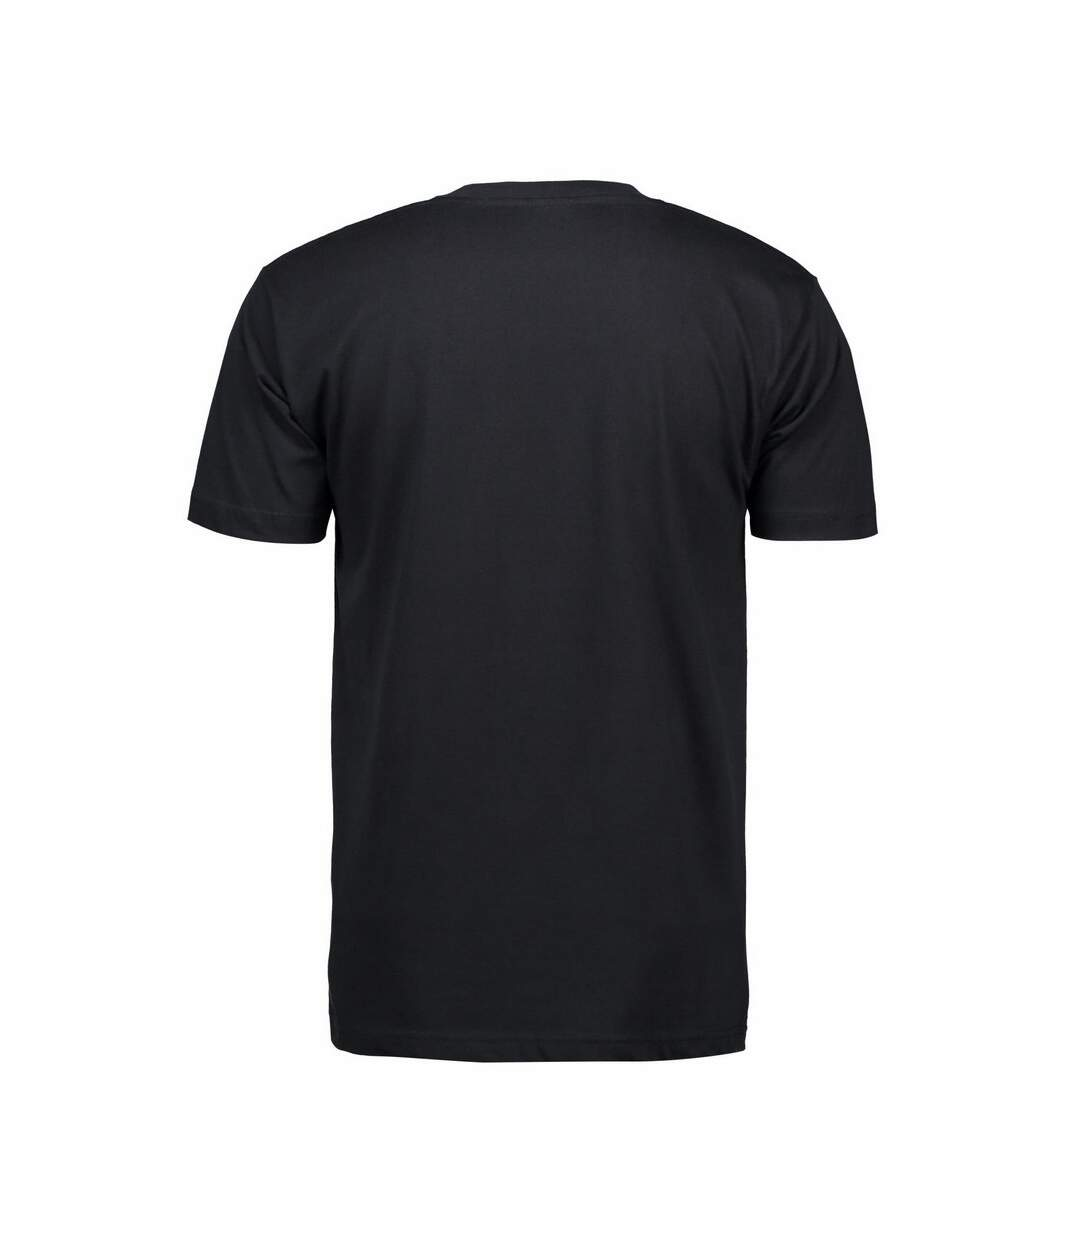 ID - T-shirt - Hommes (Noir) - UTID268